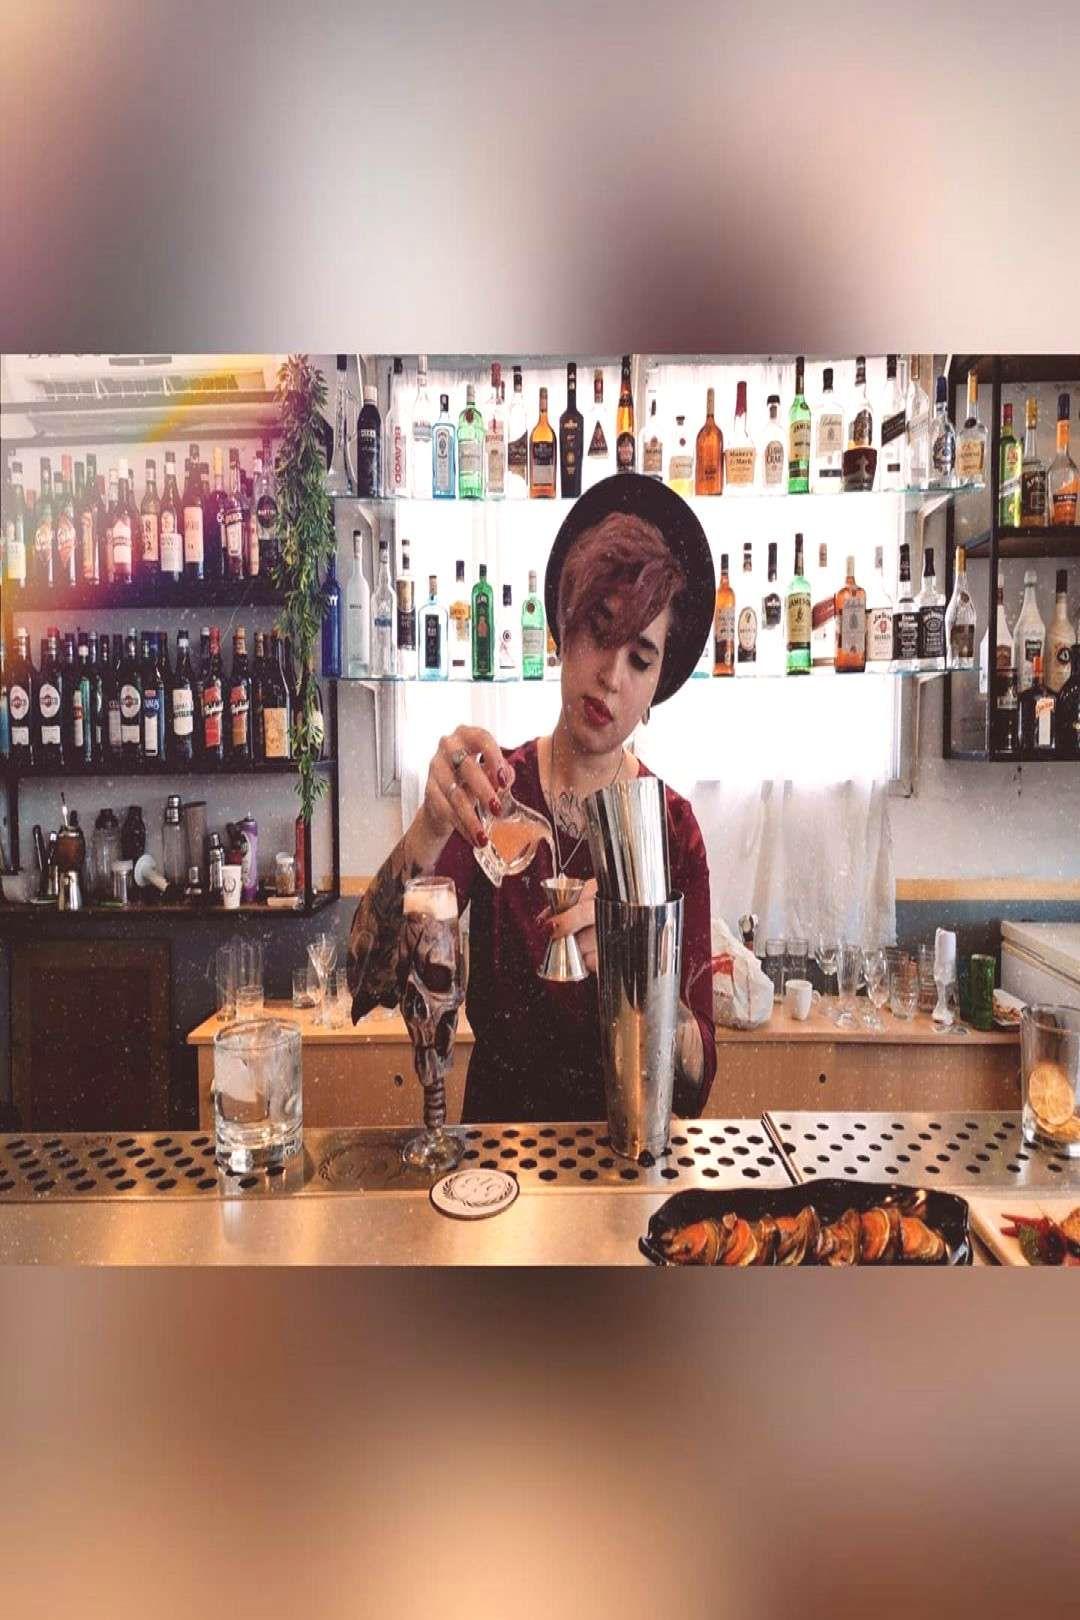 #personsittingdrink #bartender #merecelo #orgullo #siente #pichin #indoor #pero #ser #and #el #de #p #1 Siente ser el orgullo de ser Bartender, pero merecelo. - Pichin PYou can find Drinks and cocktail...